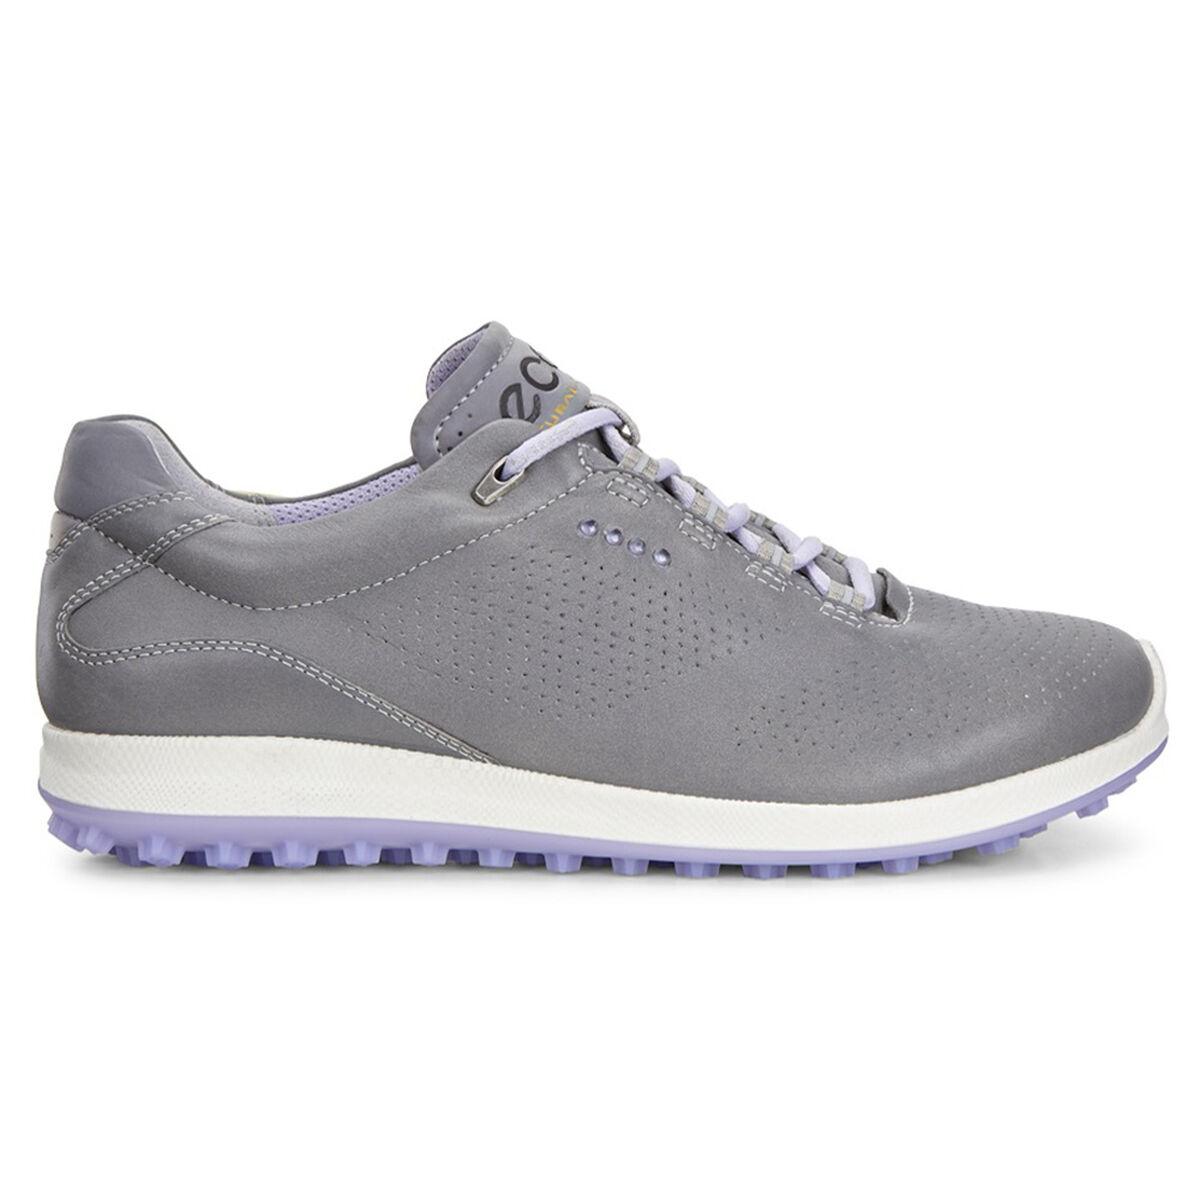 037e0a67635 ECCO BIOM Hybrid 2 Perf Women's Golf Shoe - Grey/Purple   PGA TOUR ...